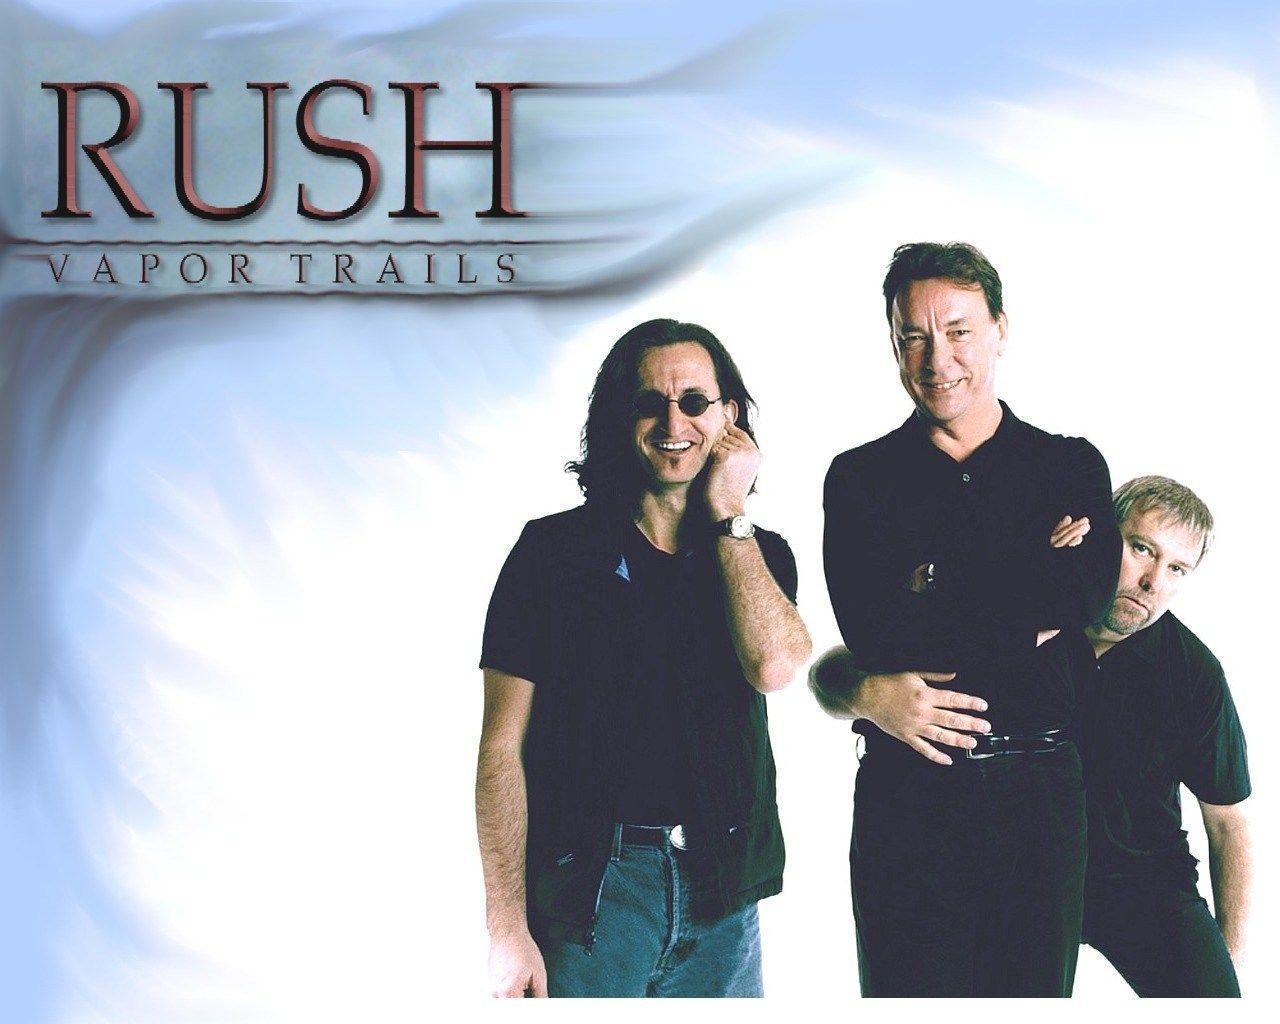 Rush Band Wallpapers 1280x1024